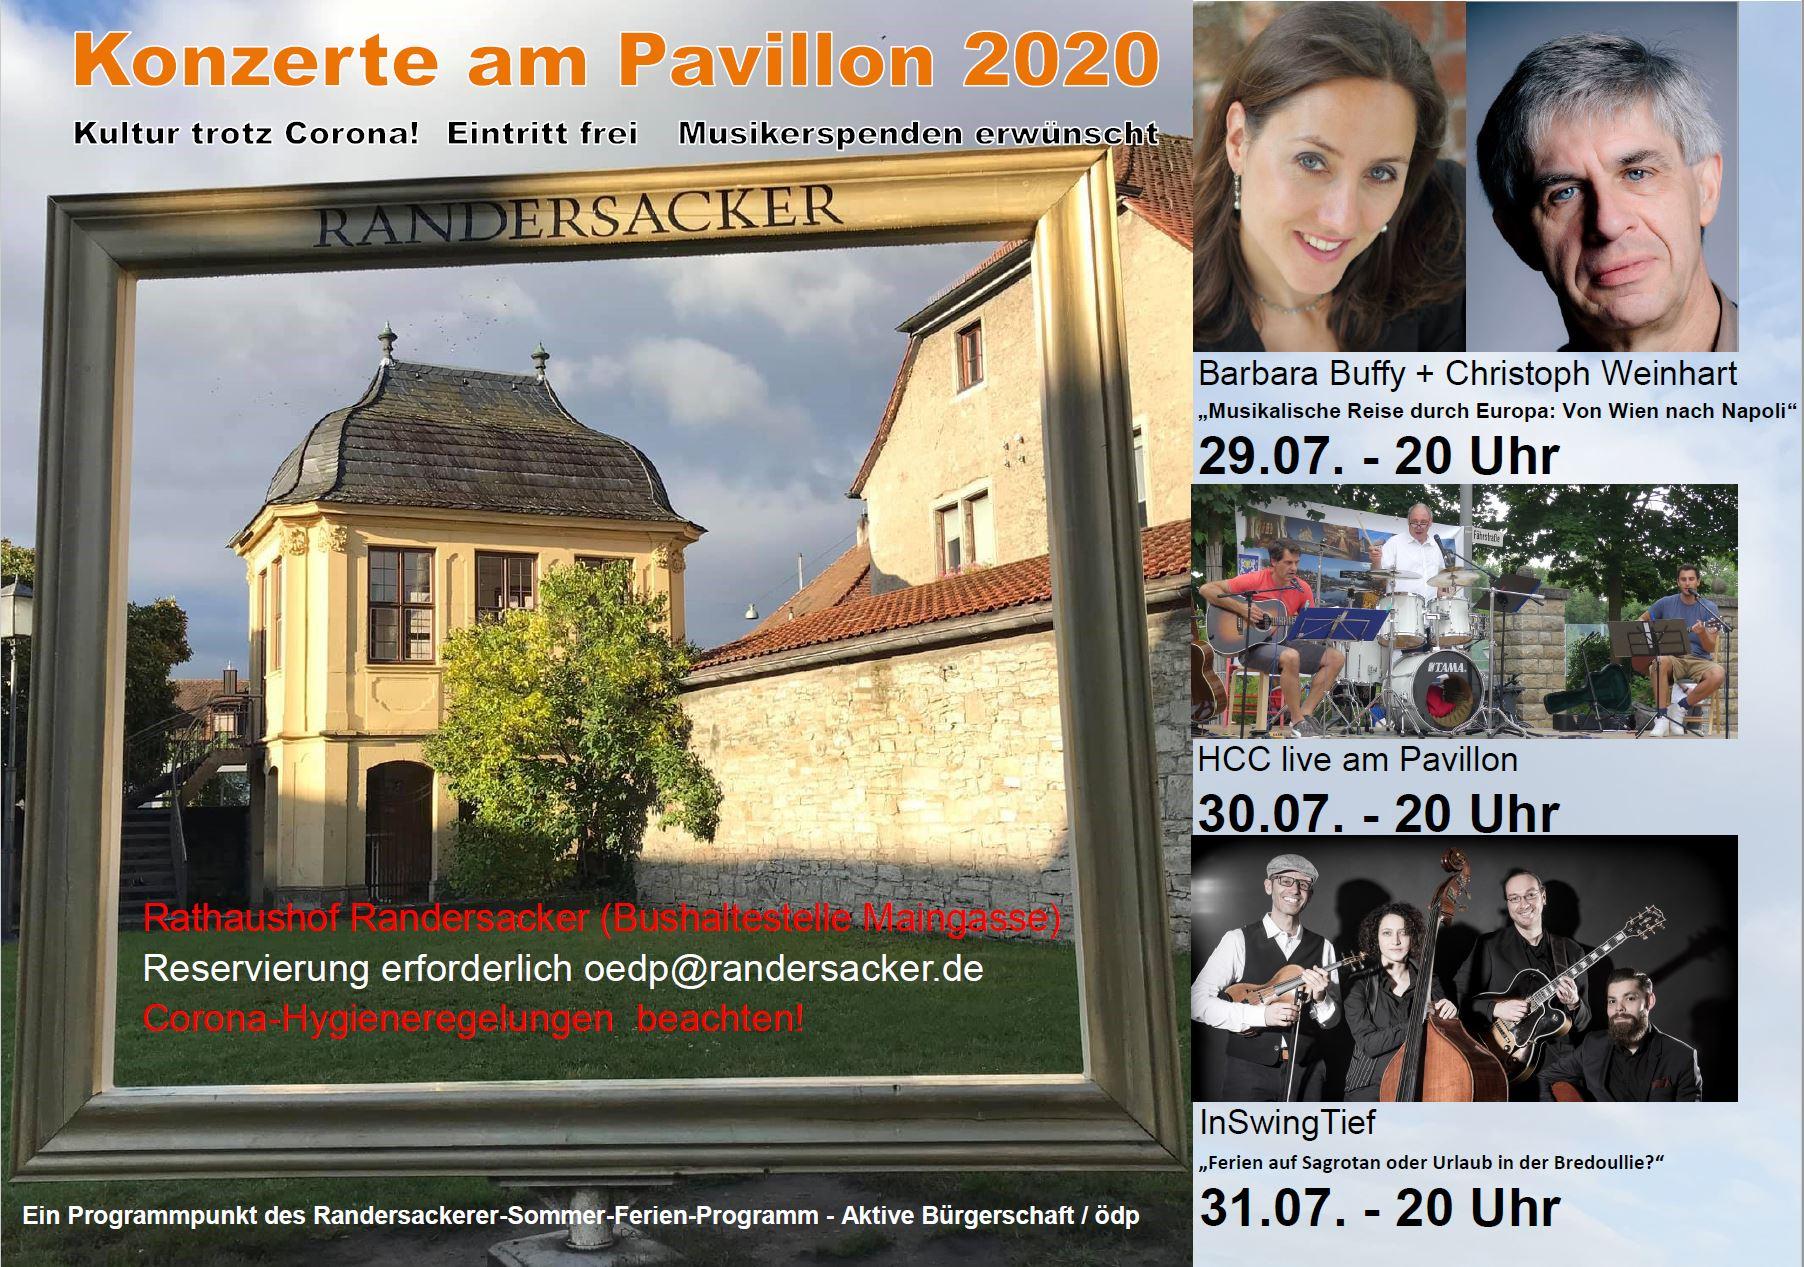 Konzerte am Pavillon 2020 - Barbara Buffy, HCC und Inswingtief